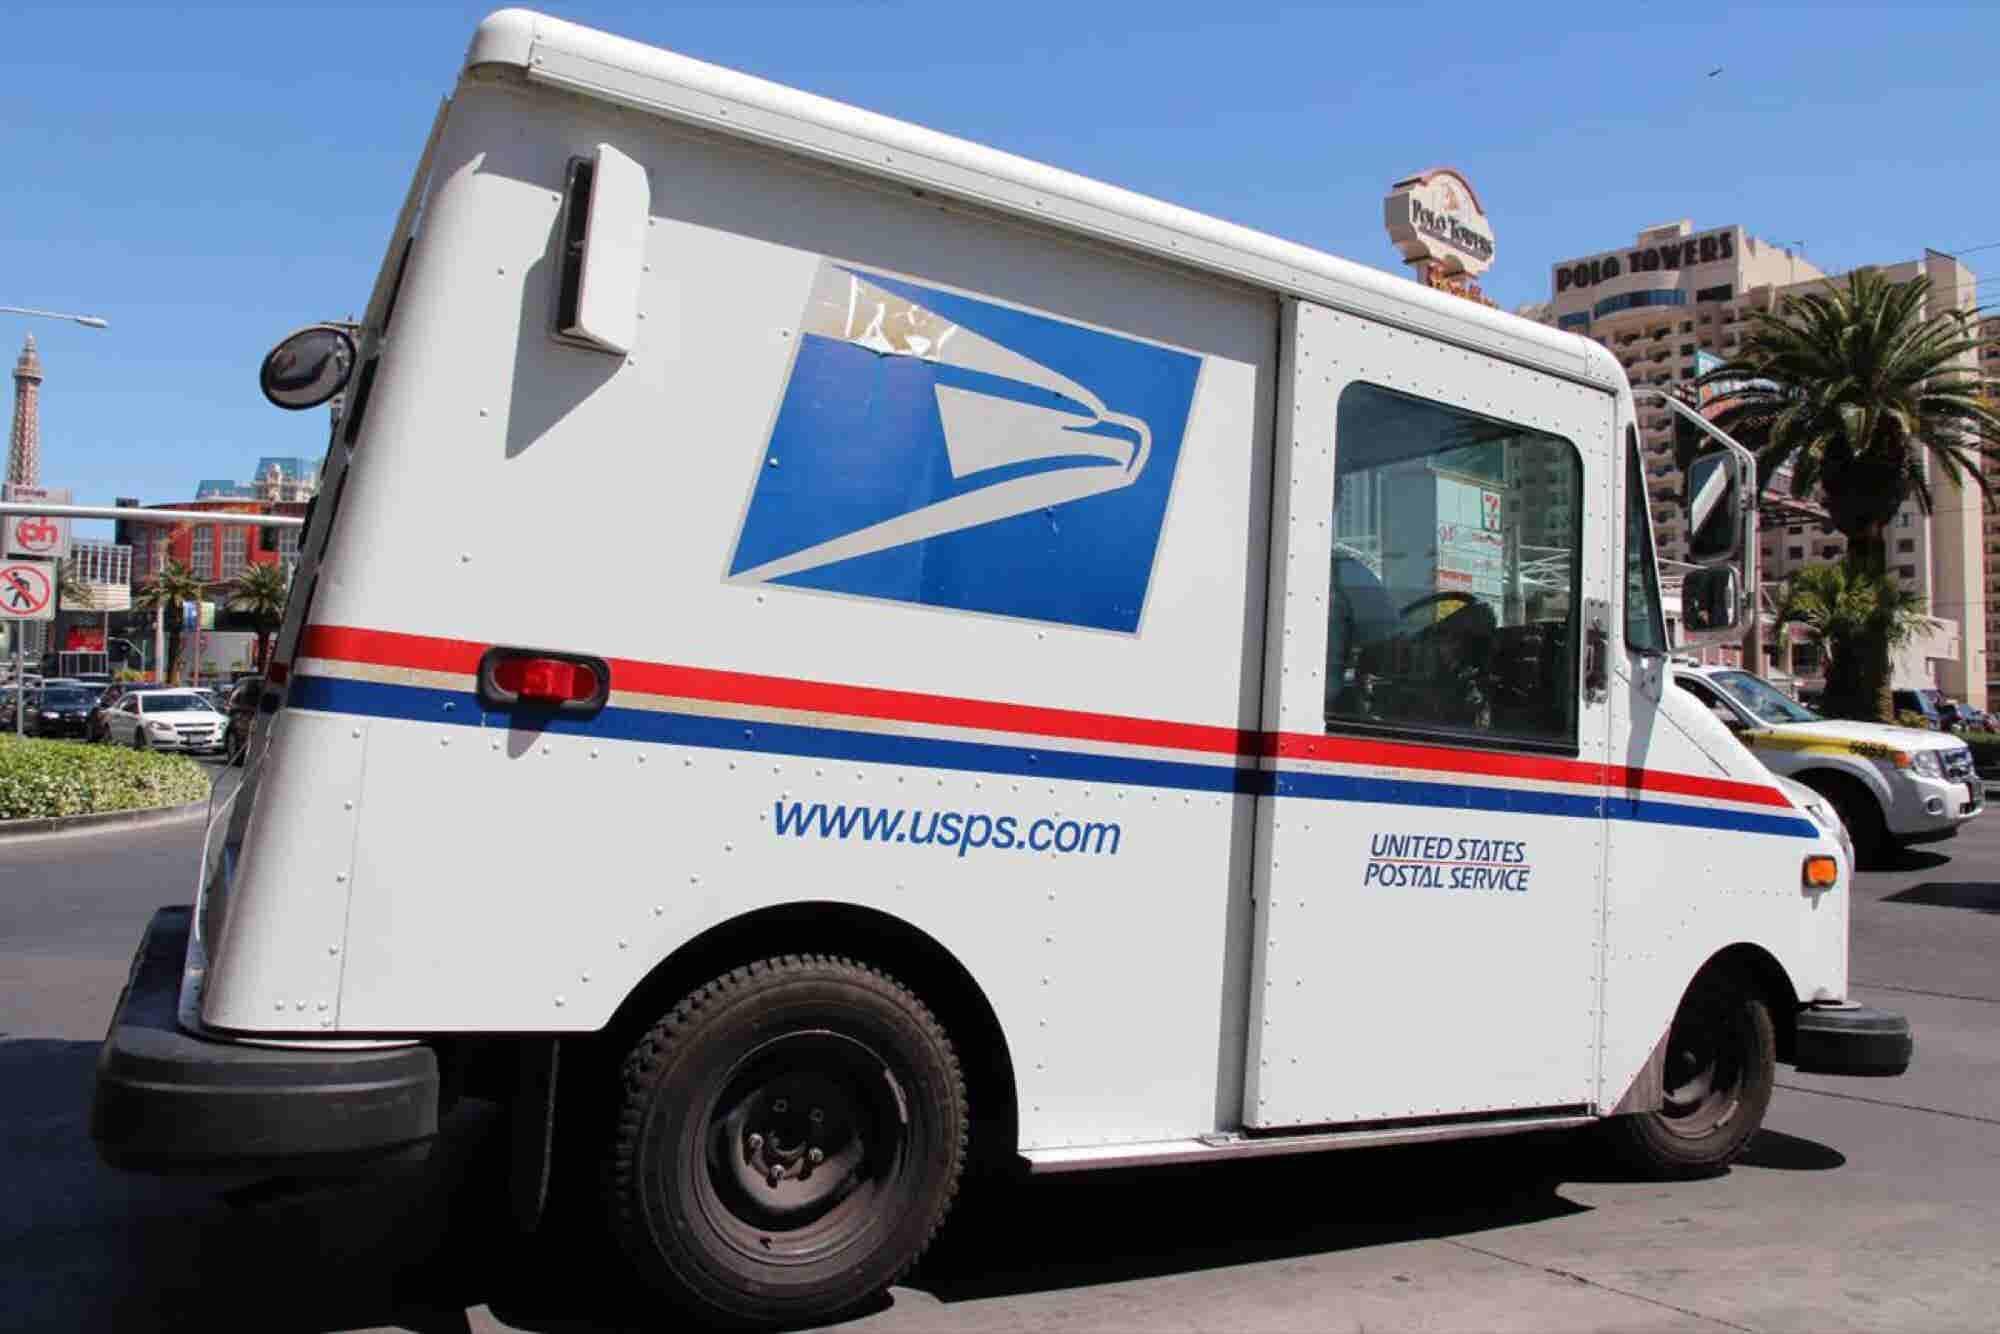 The U.S. Postal Service Just Got a Side Hustle Delivering Groceries. Do You Have Another Gig?